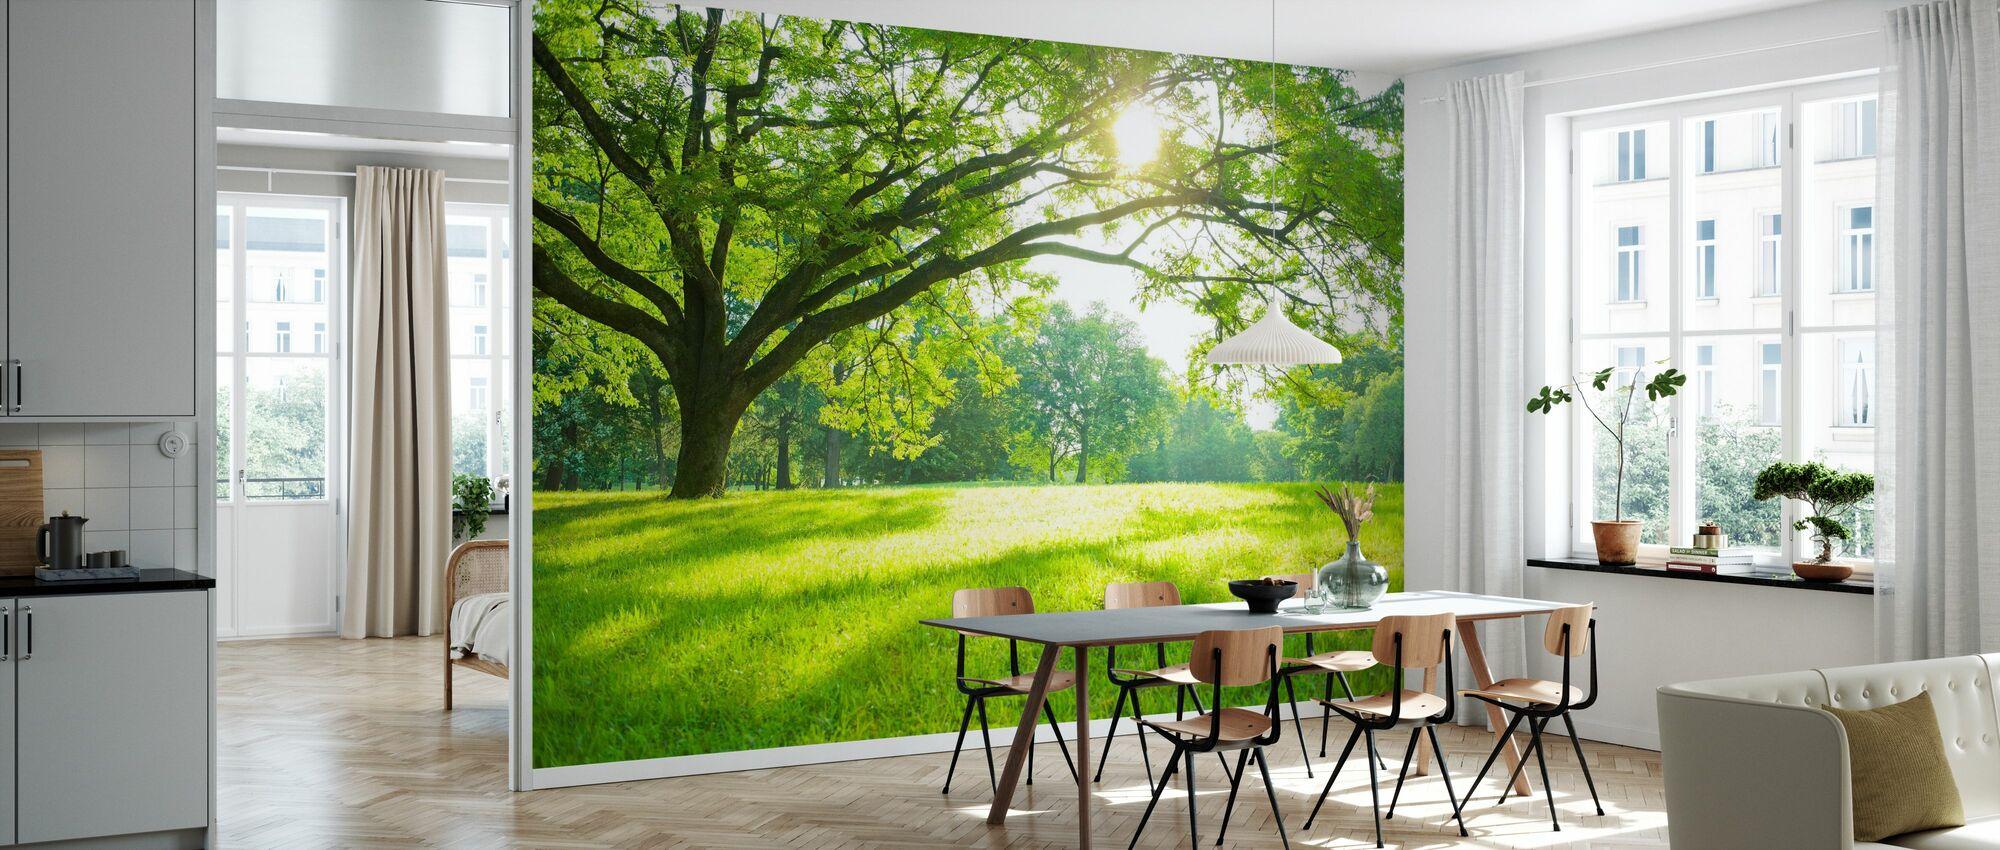 Summer Park - Wallpaper - Kitchen